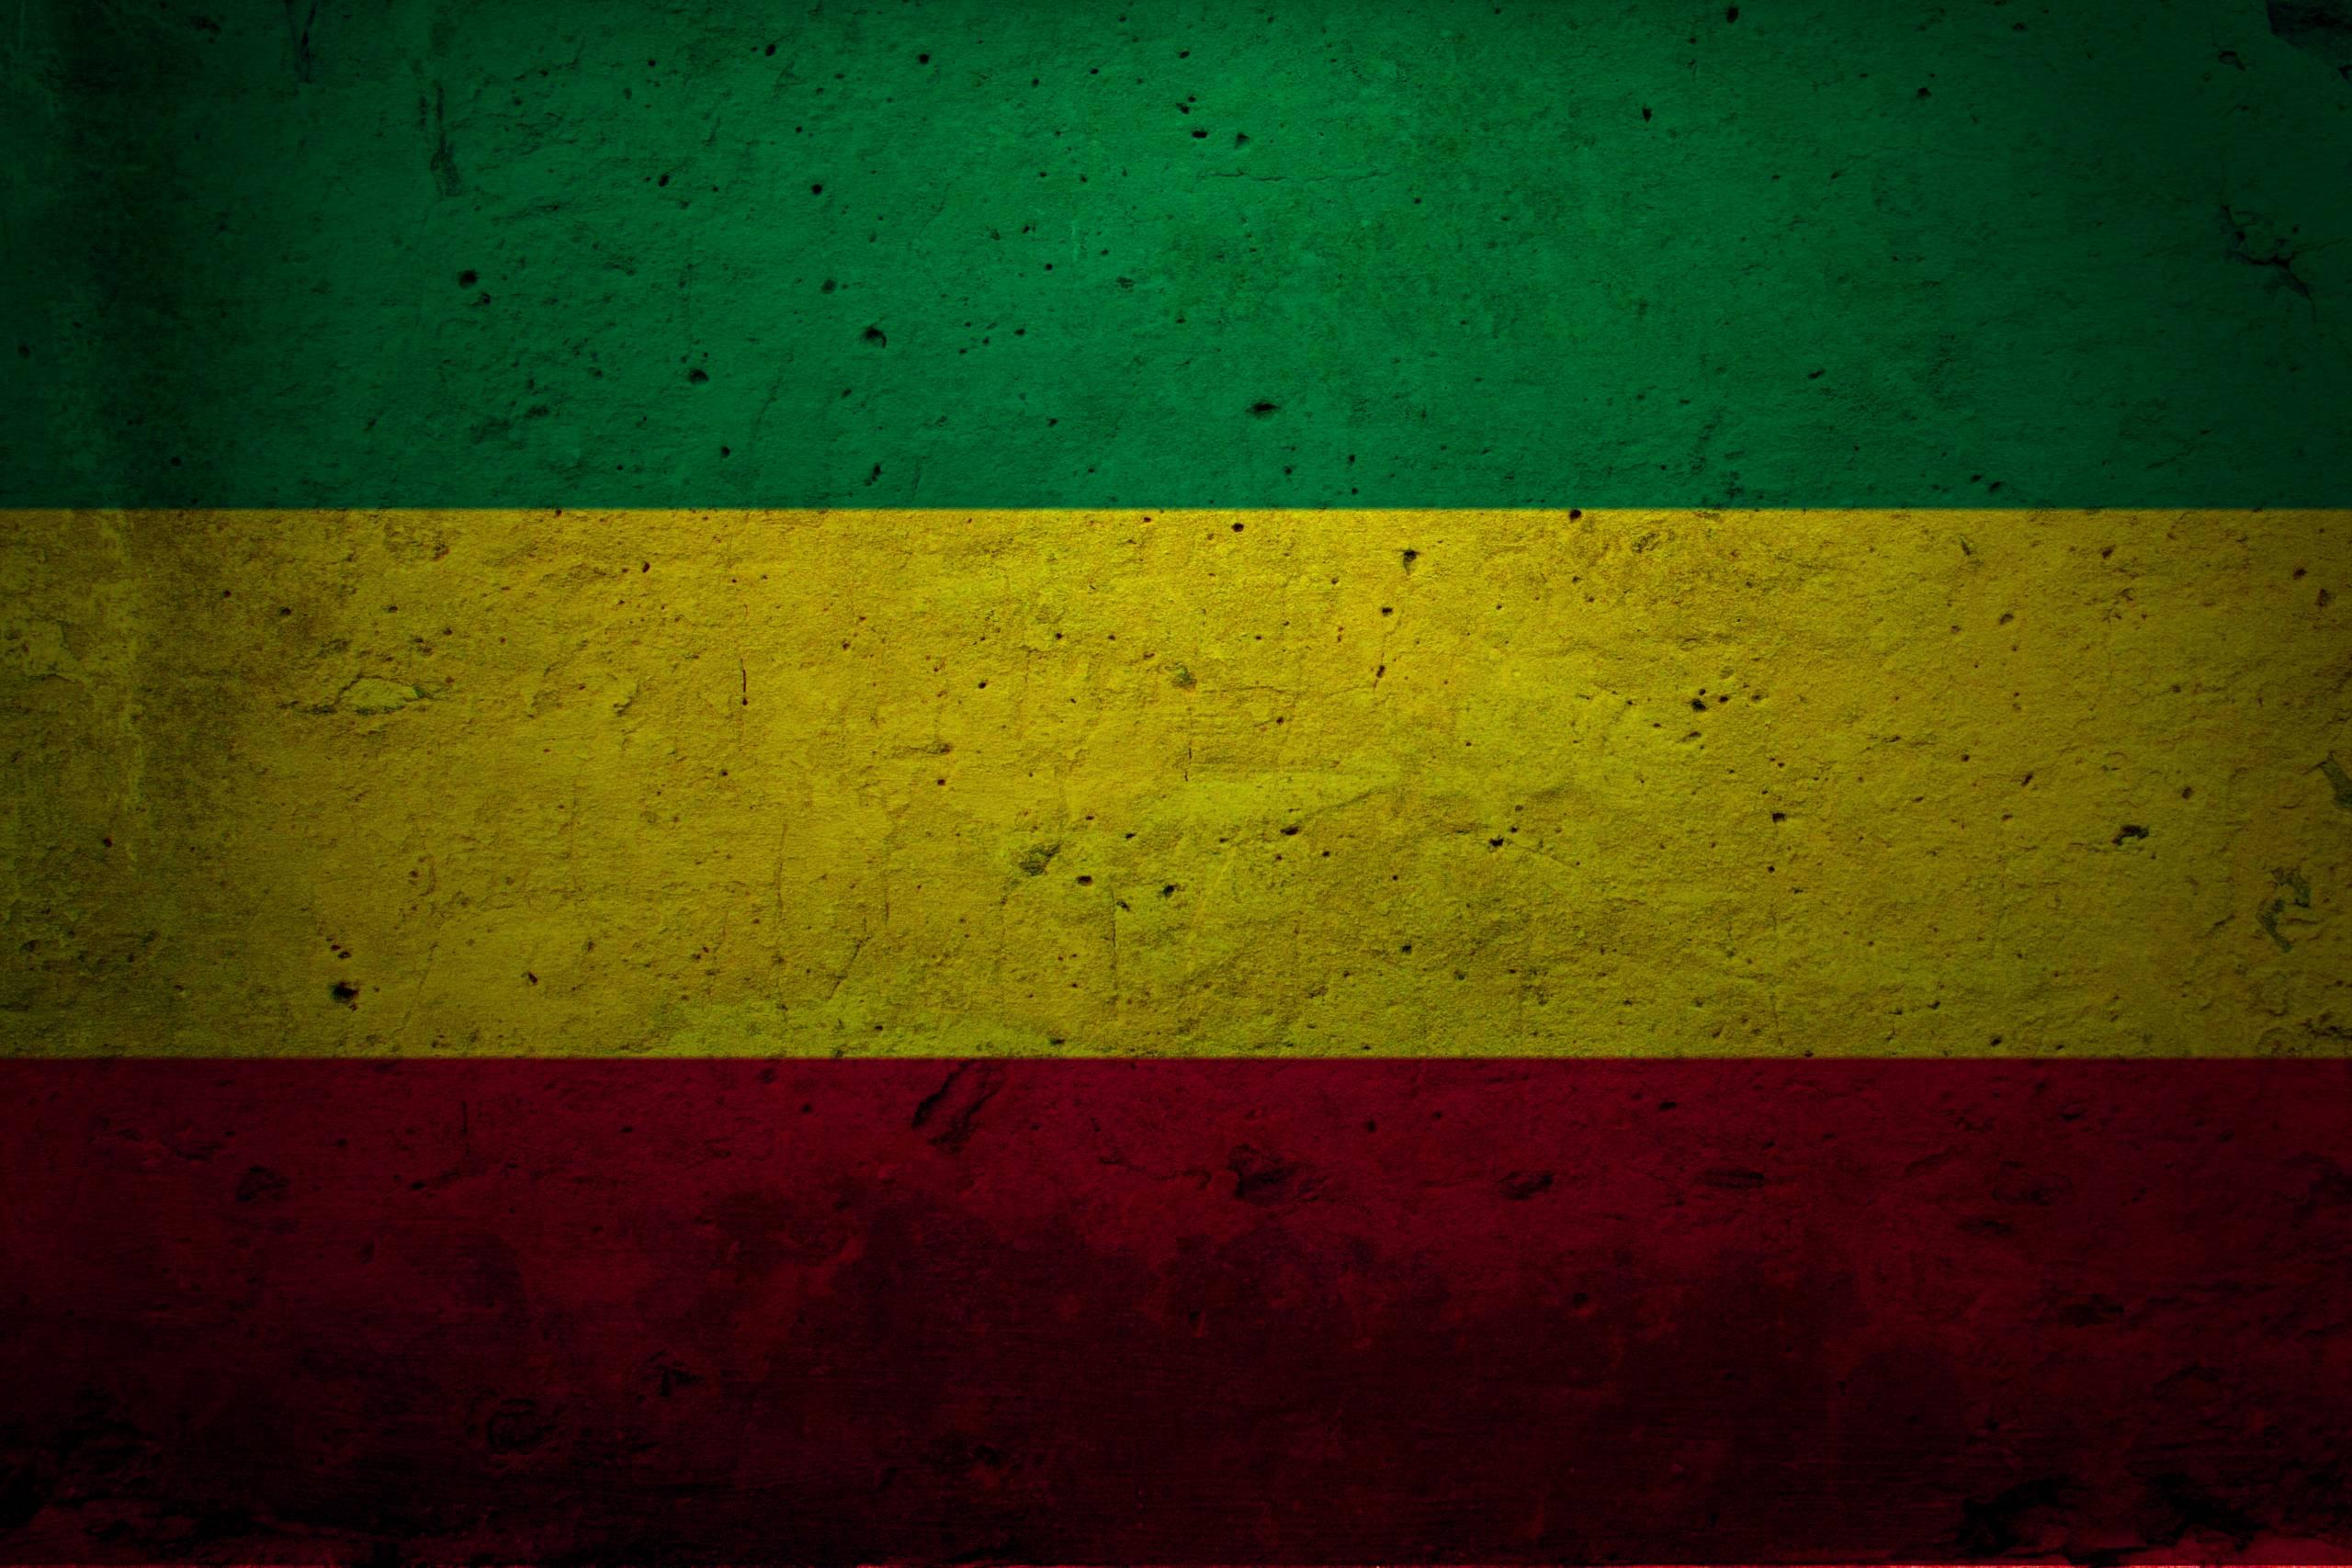 Pin Jamaican Flag Wallpaper on Pinterest